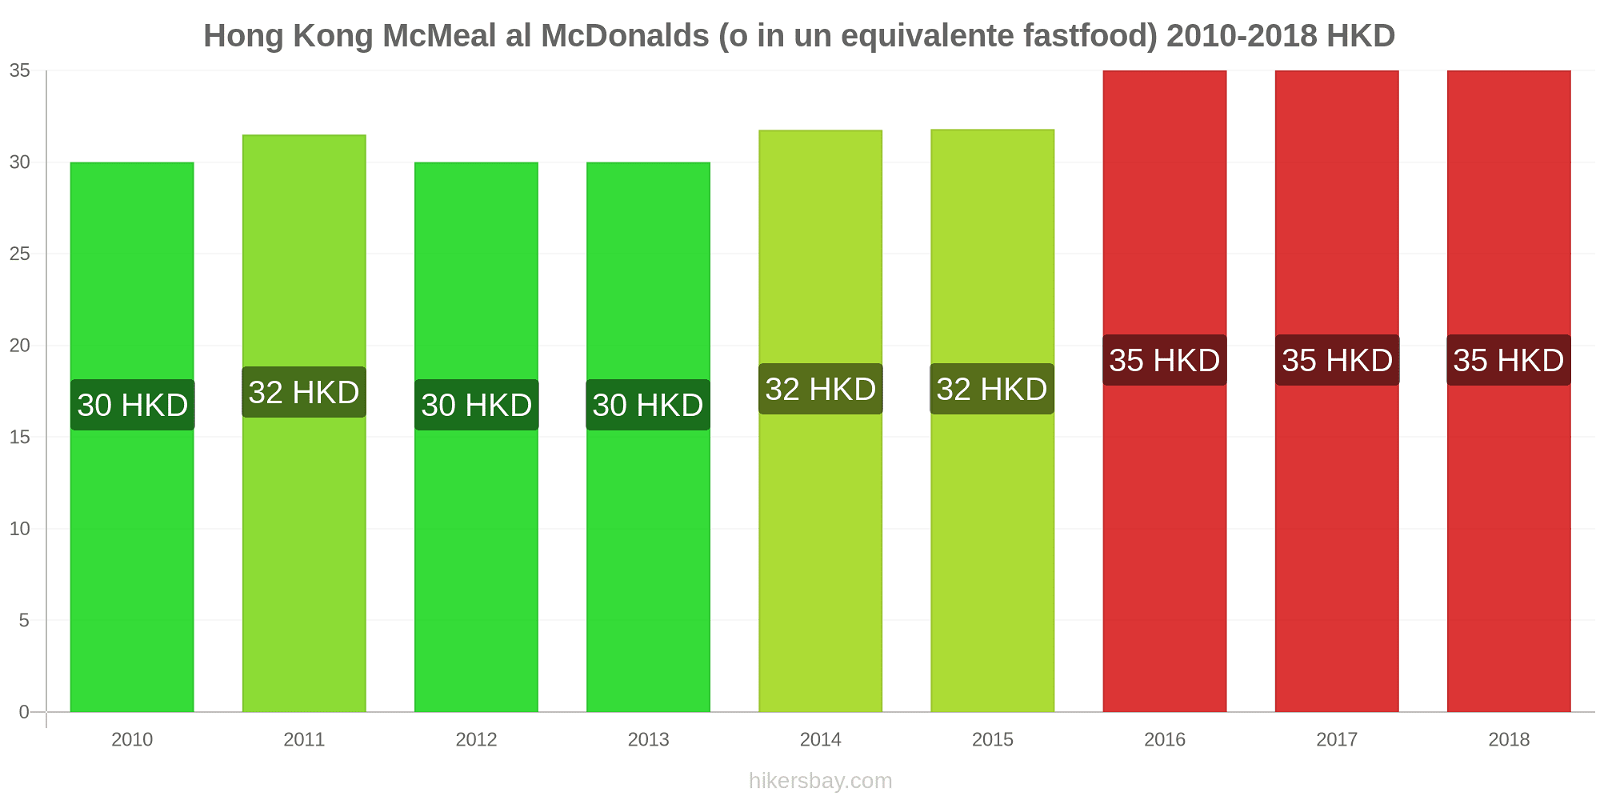 Hong Kong variazioni di prezzo McMeal al McDonalds (o in un equivalente fastfood) hikersbay.com